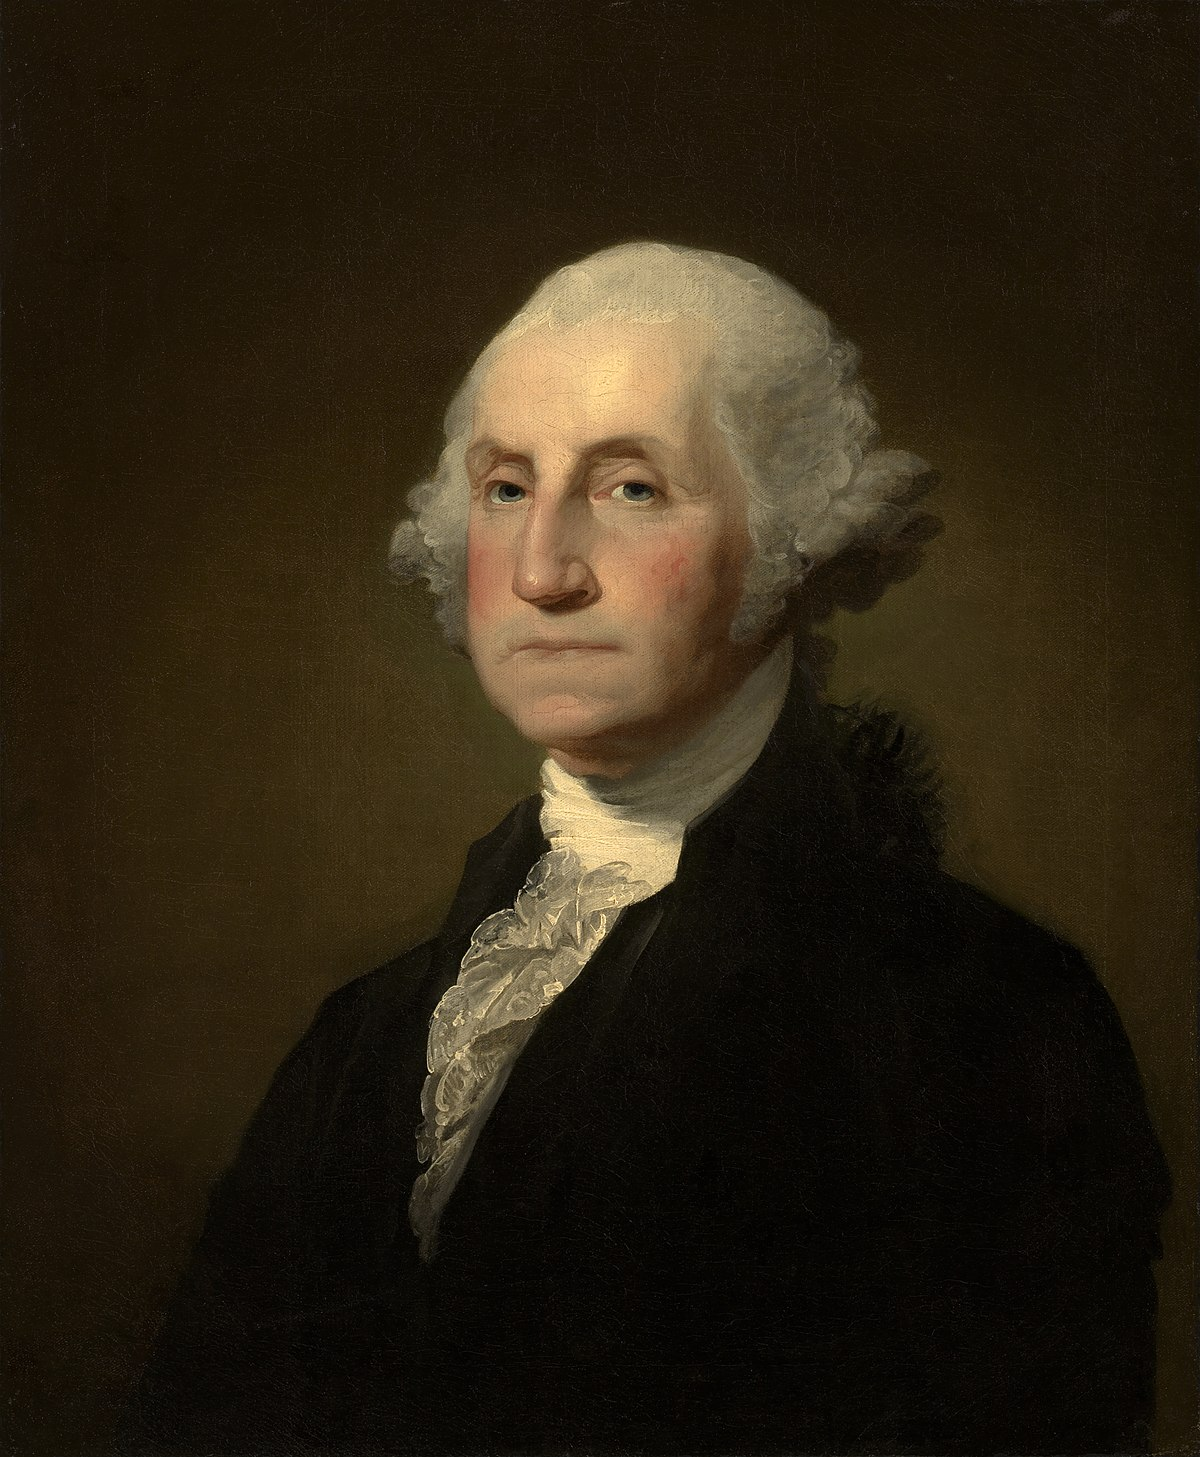 [Washington]